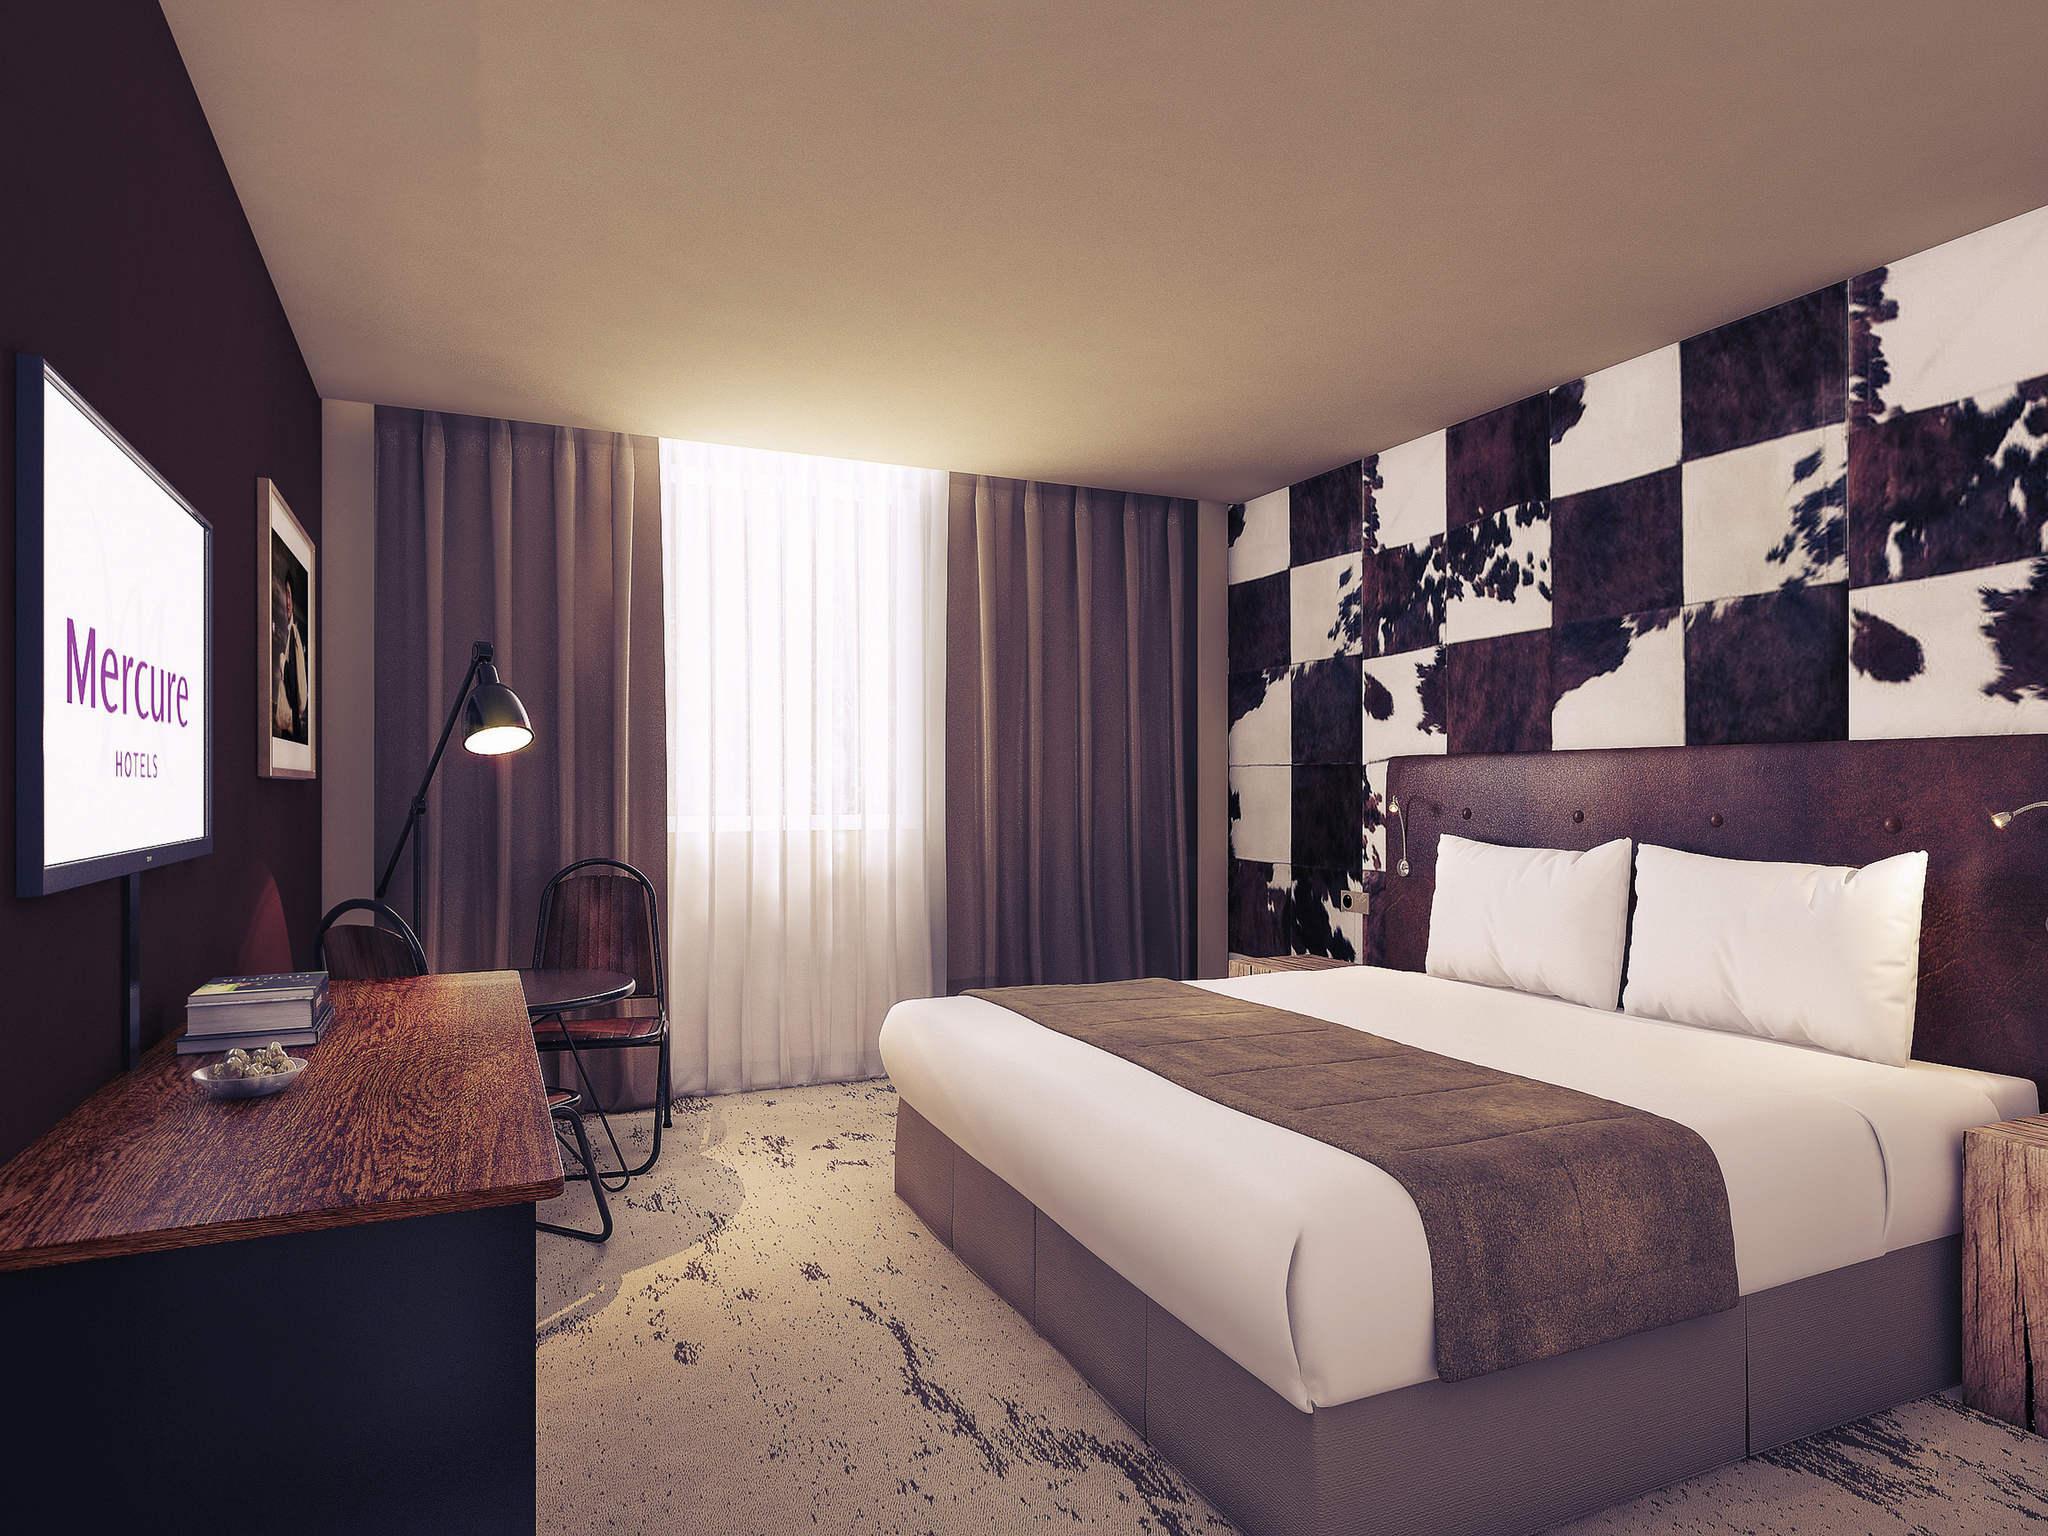 Hotel in CHAMONIX MONT-BLANC - Mercure Chamonix Les Bossons Hotel